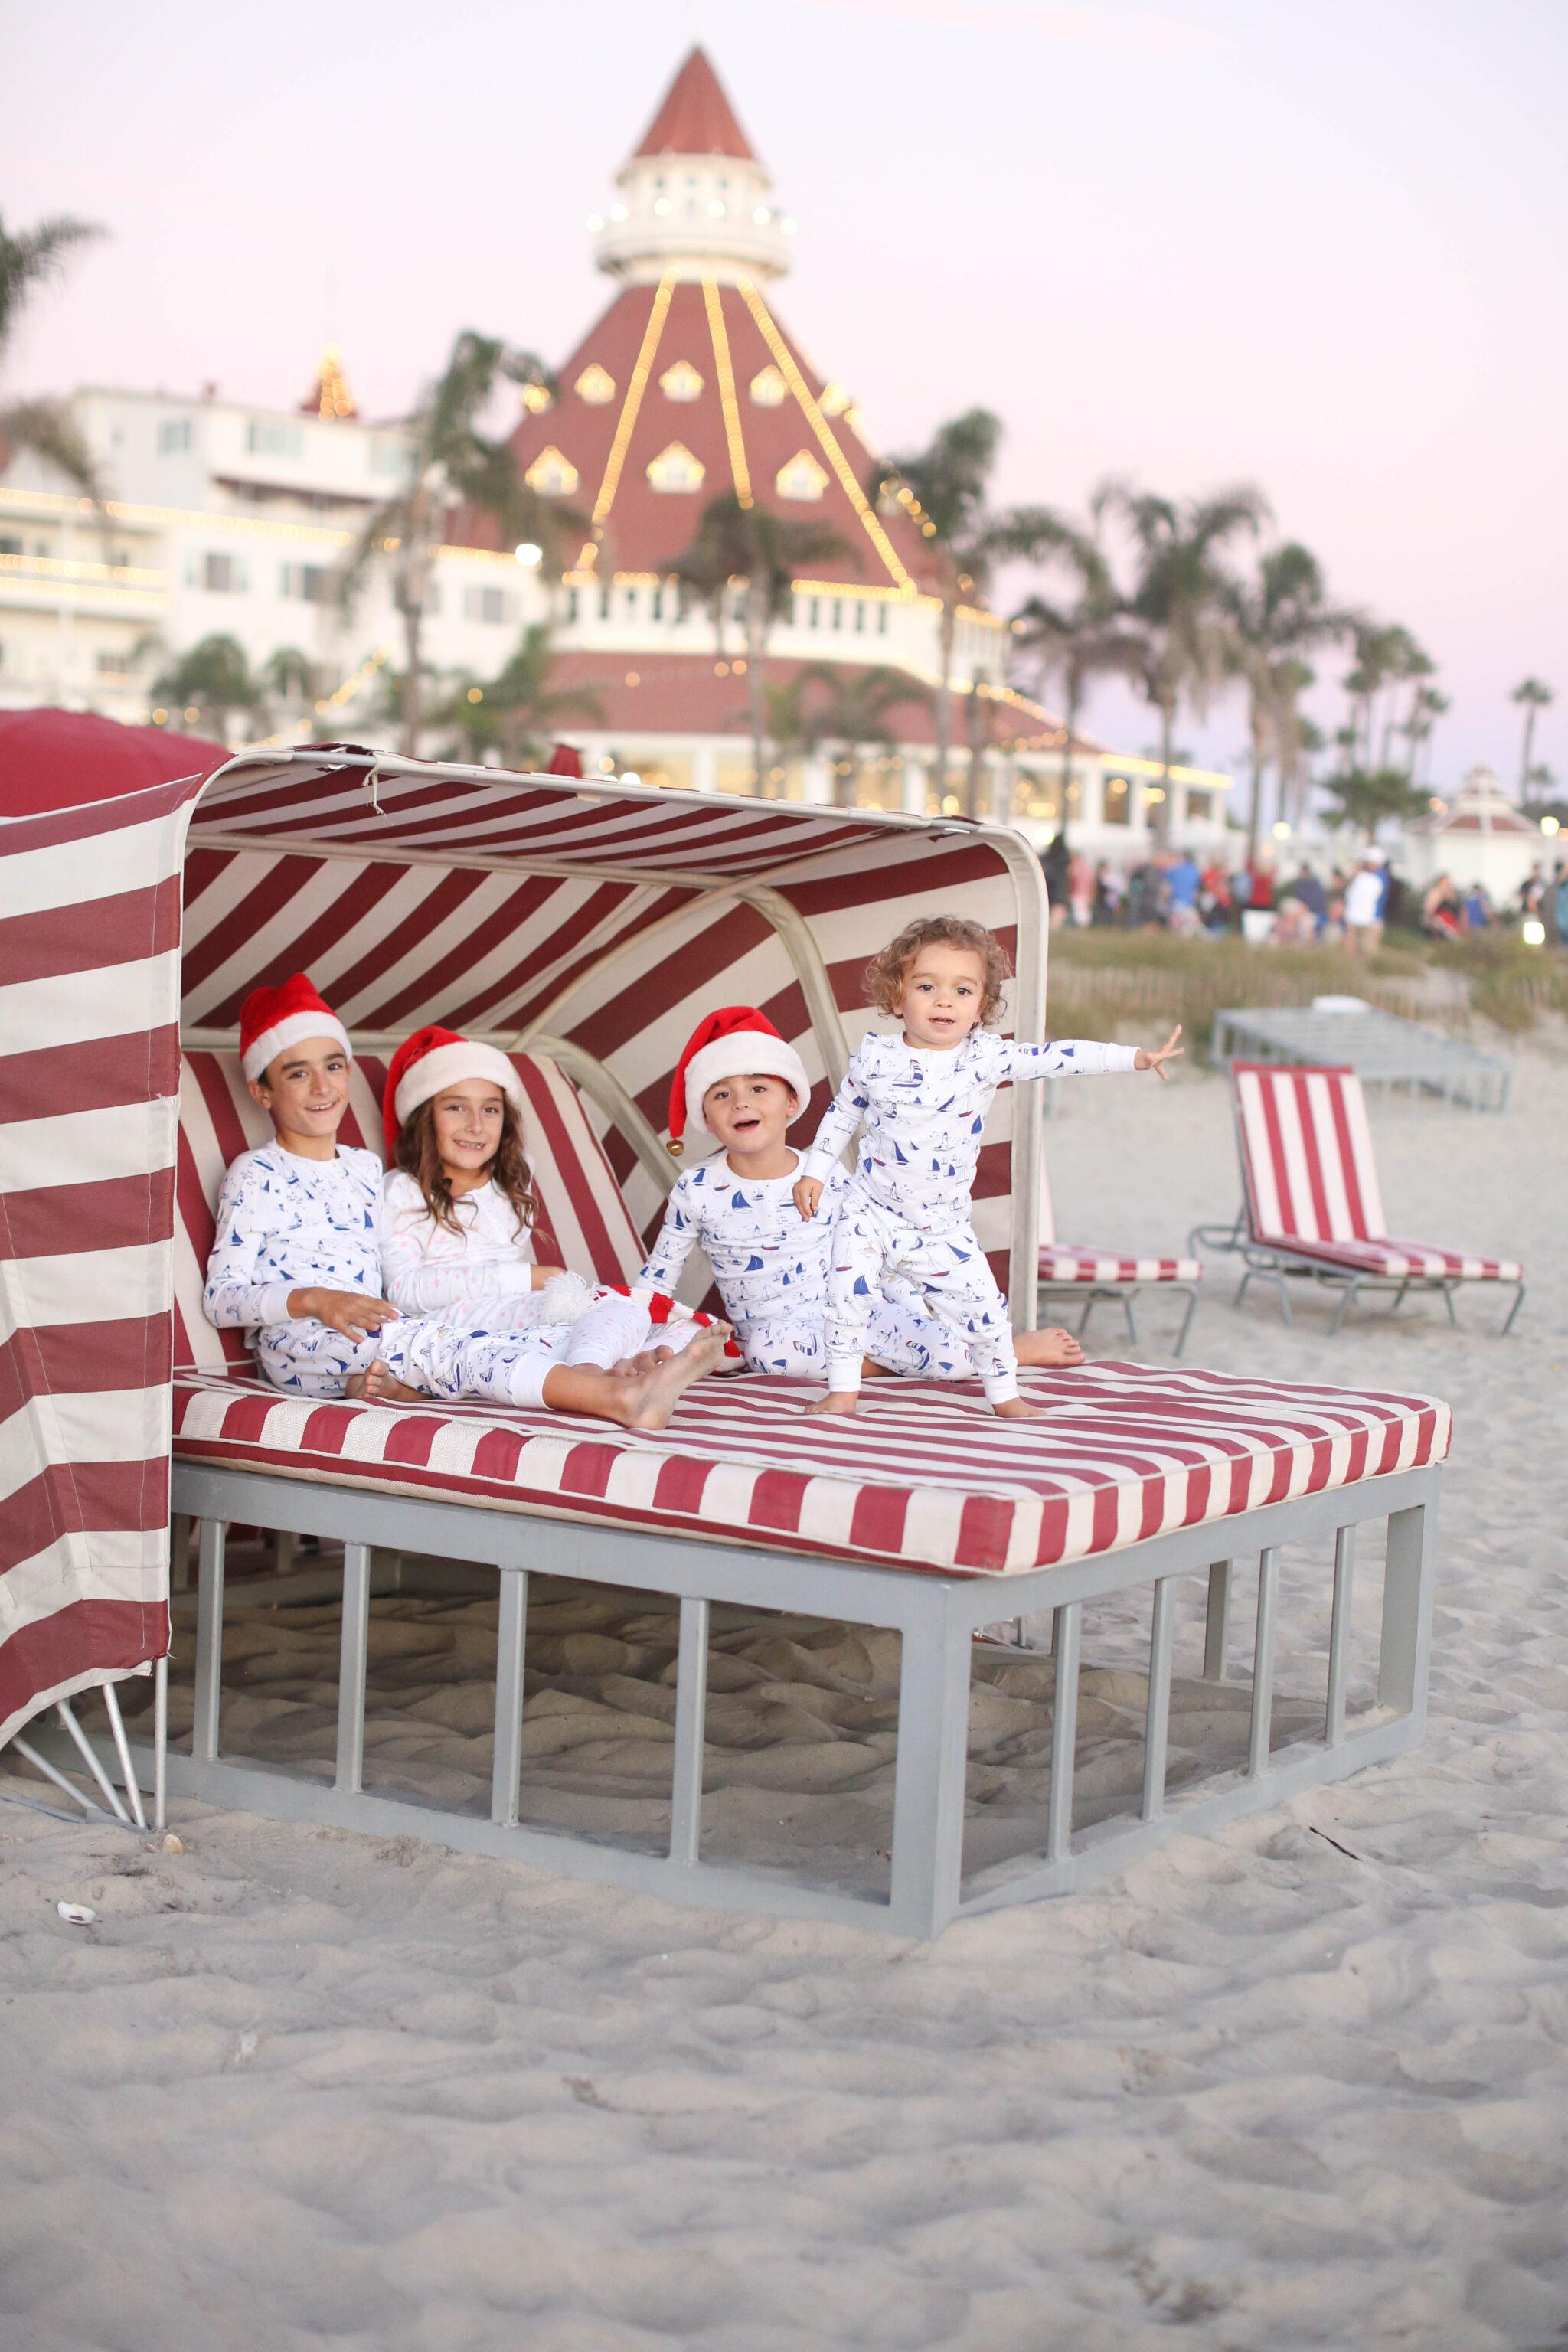 kids in santa hats on the beach